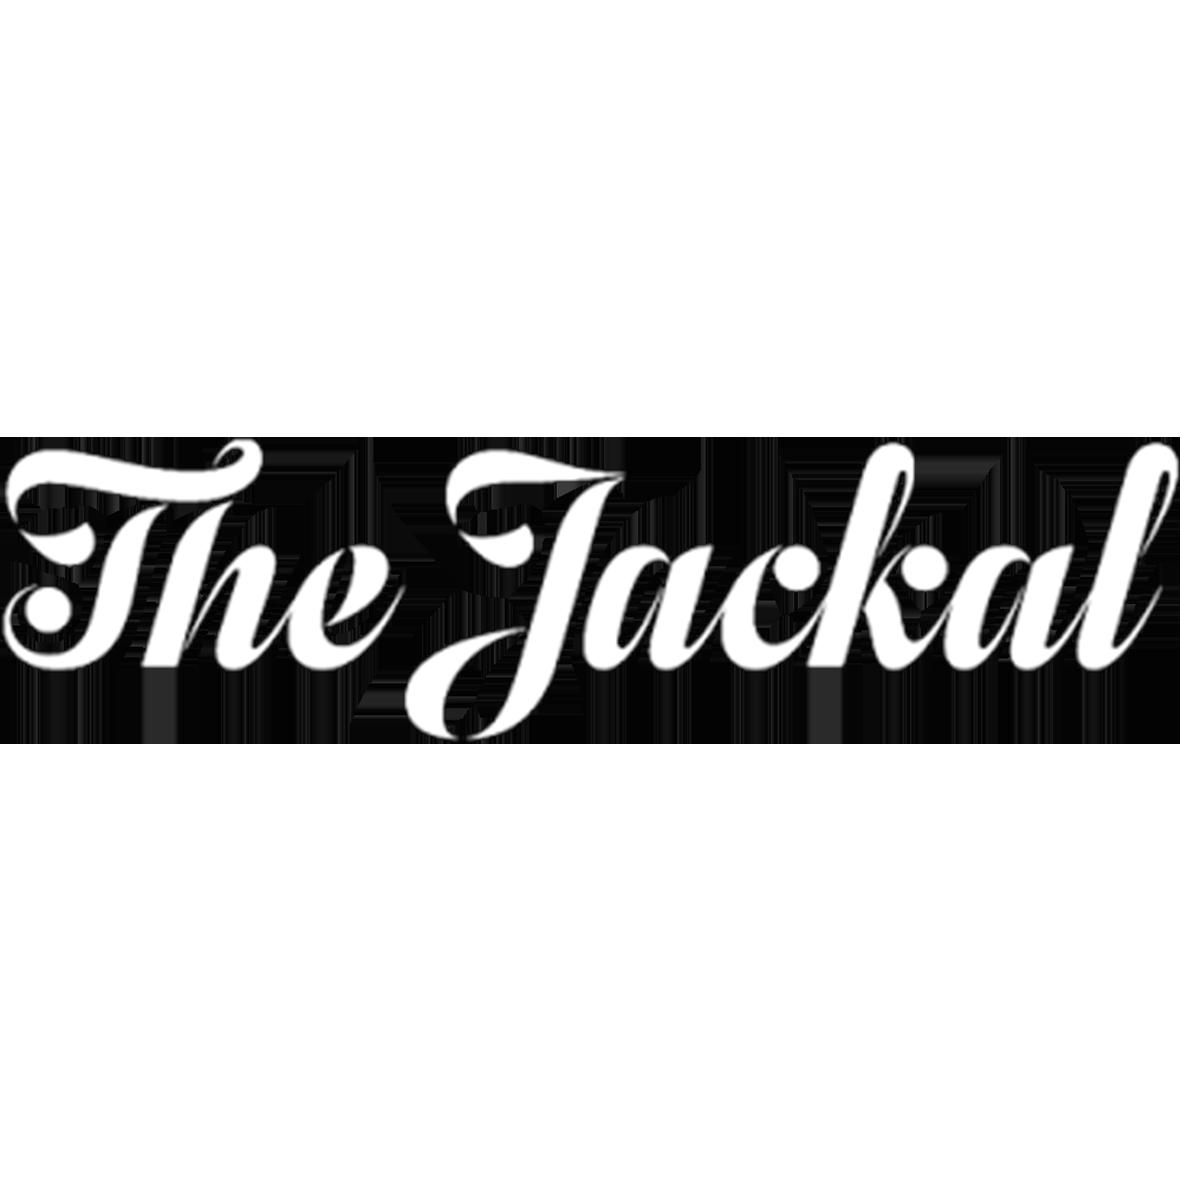 https://www.wearekindred.com/wp-content/uploads/2019/12/The-Jackal.png